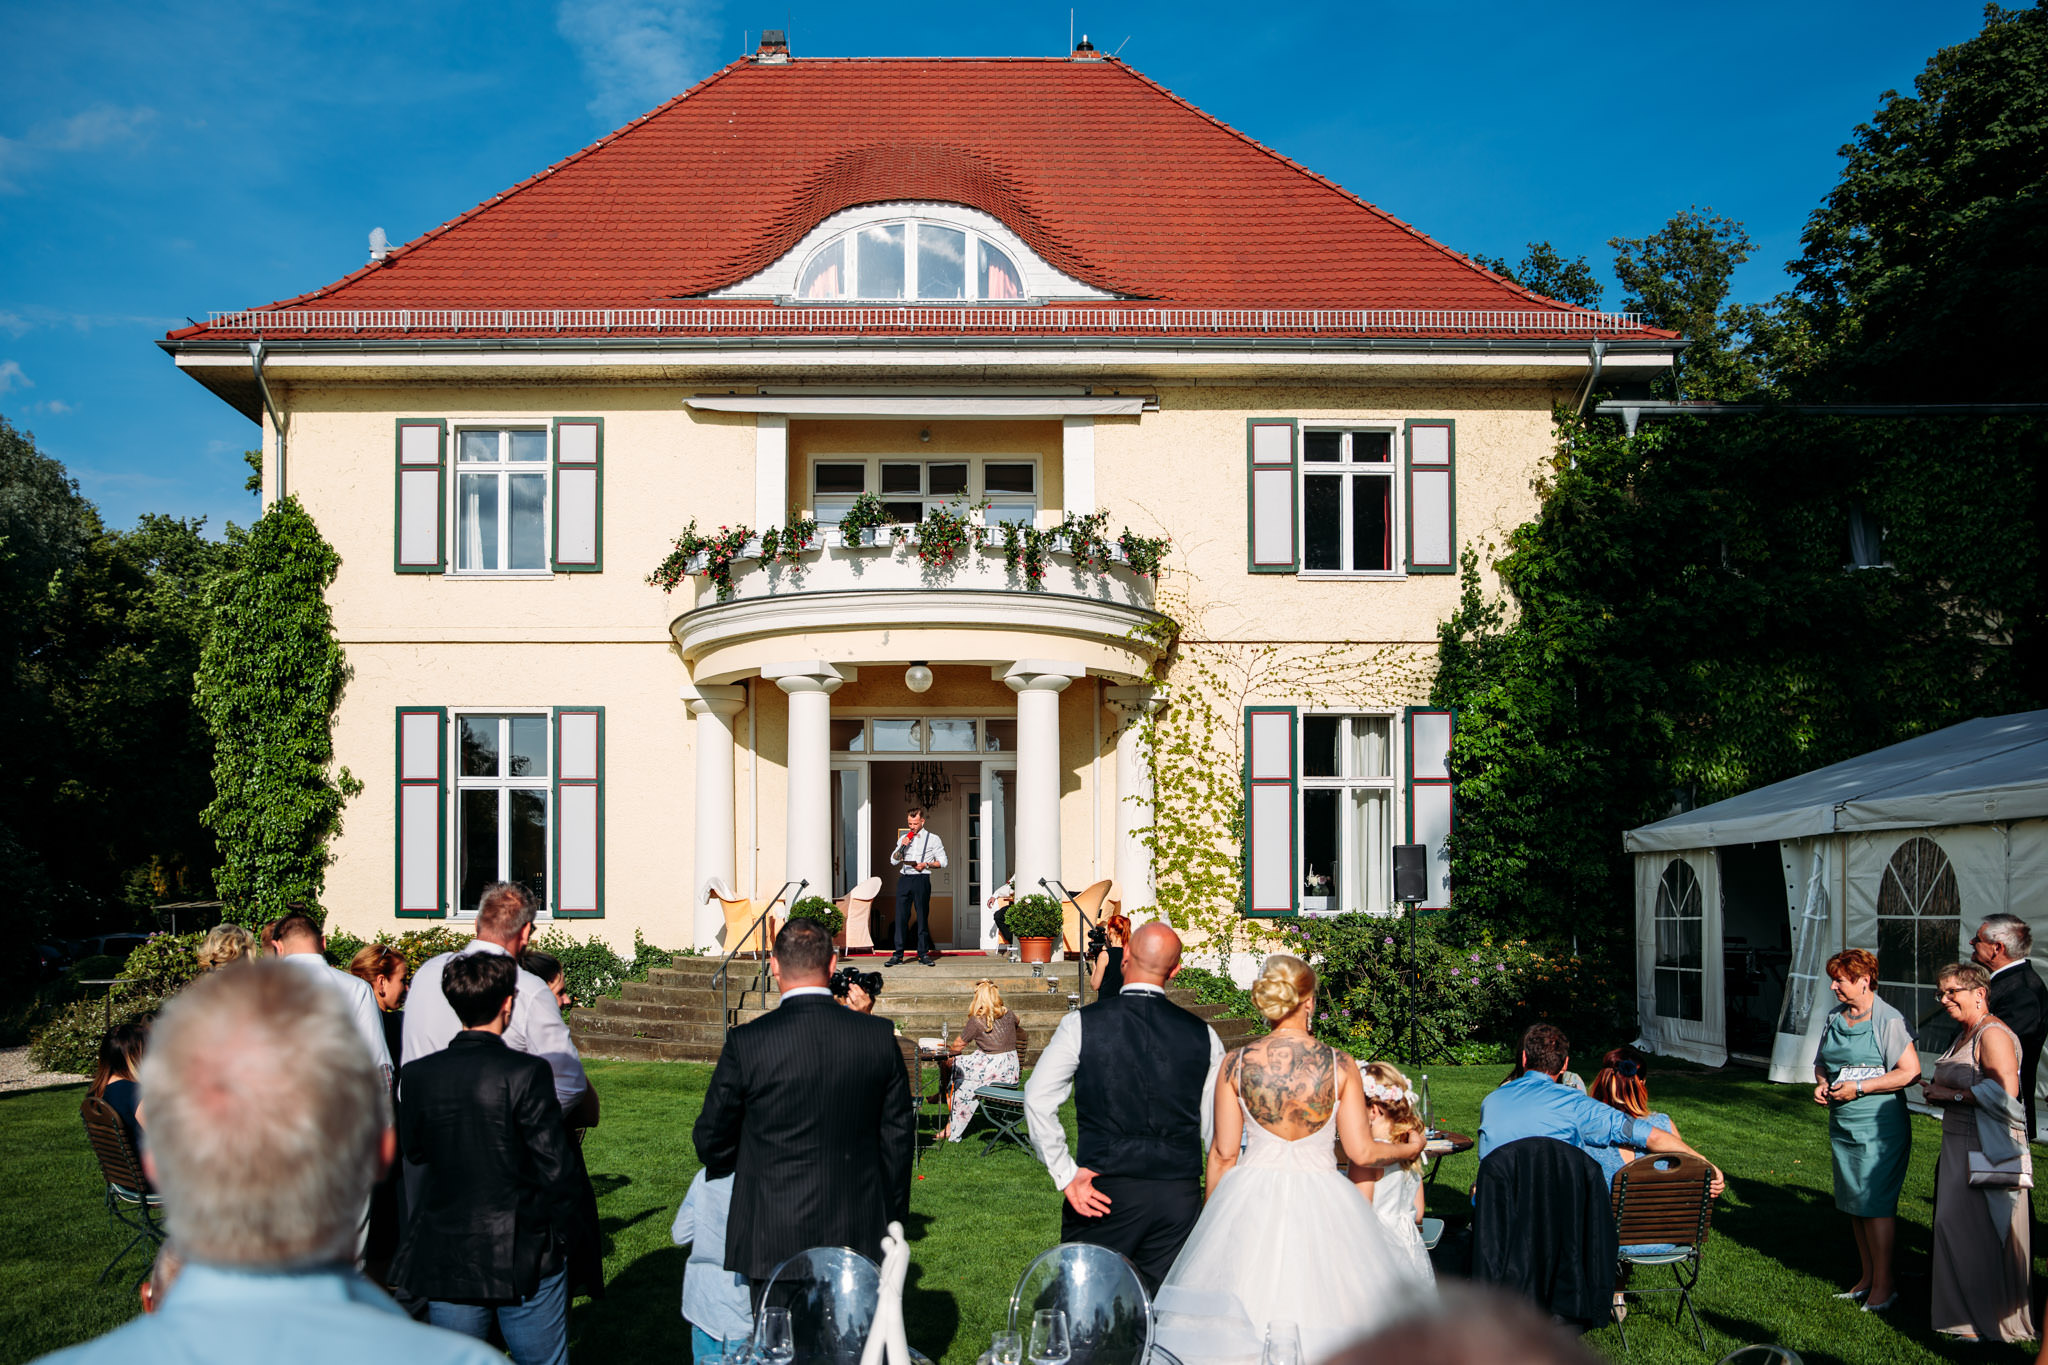 190531_Hochzeit_Potsdam_Schloss_Gut_Golm_Vorschau_web_0021.jpg